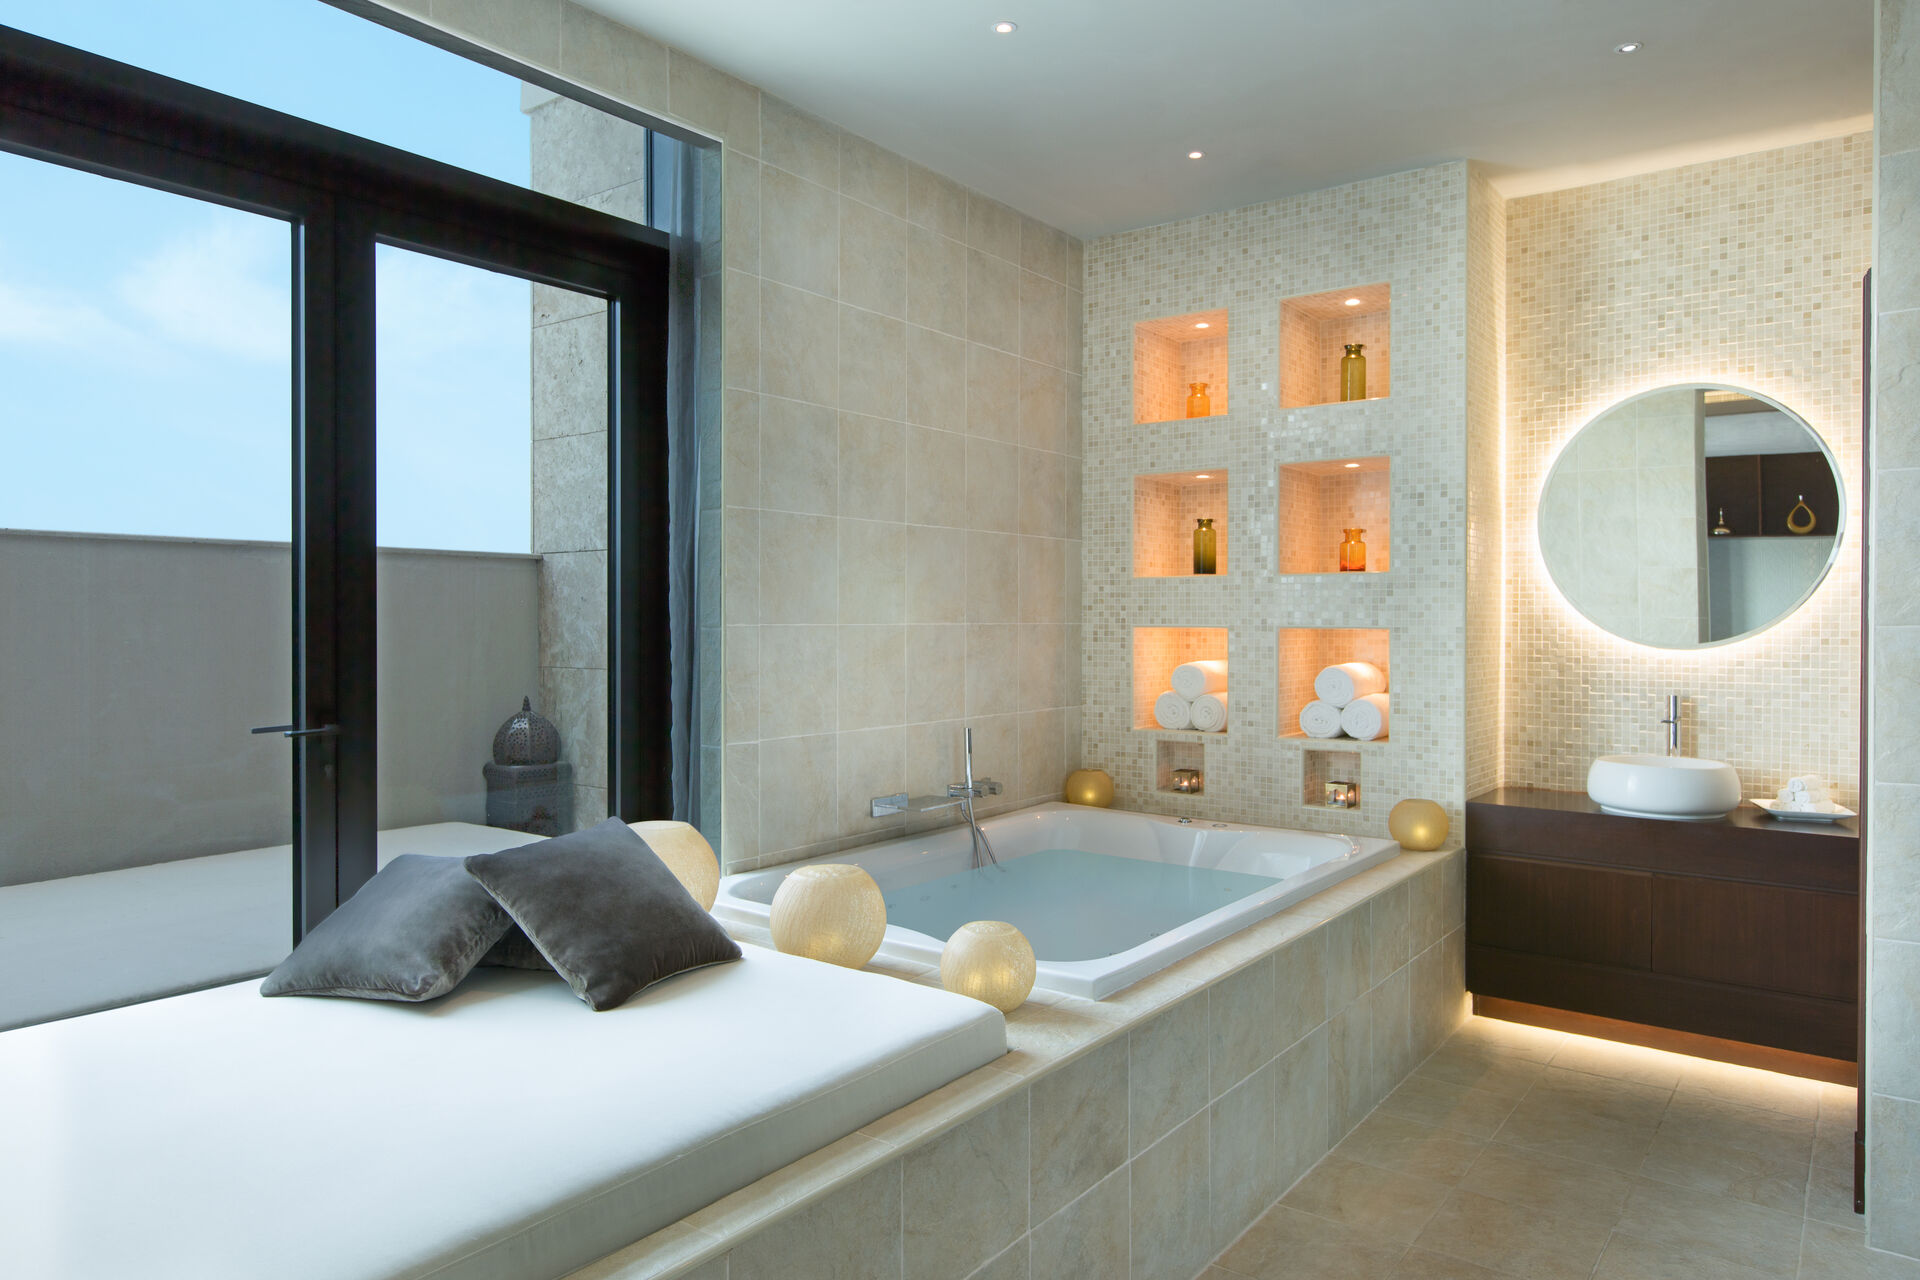 https://cms.satur.sk/data/imgs/tour_image/orig/goco-spa-ajman-treatment-room-bath-2-1960356.jpg